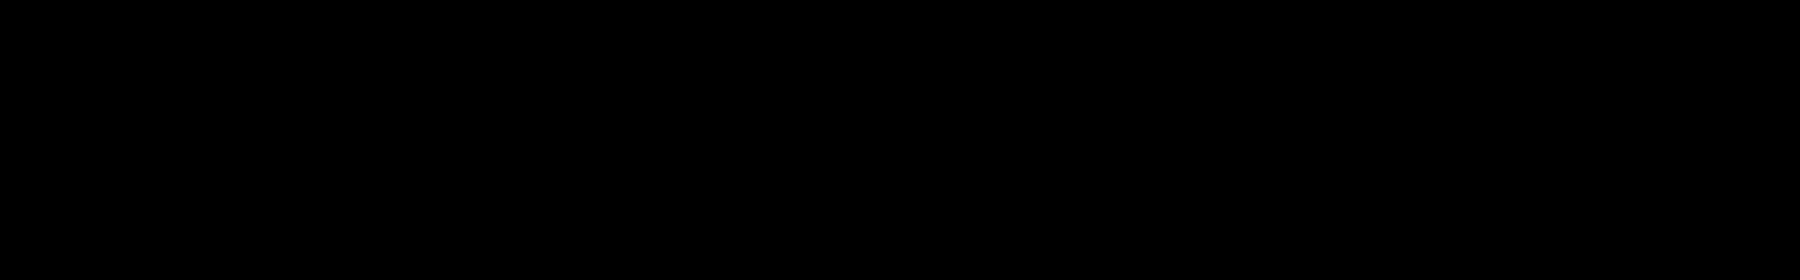 Cybertron audio waveform